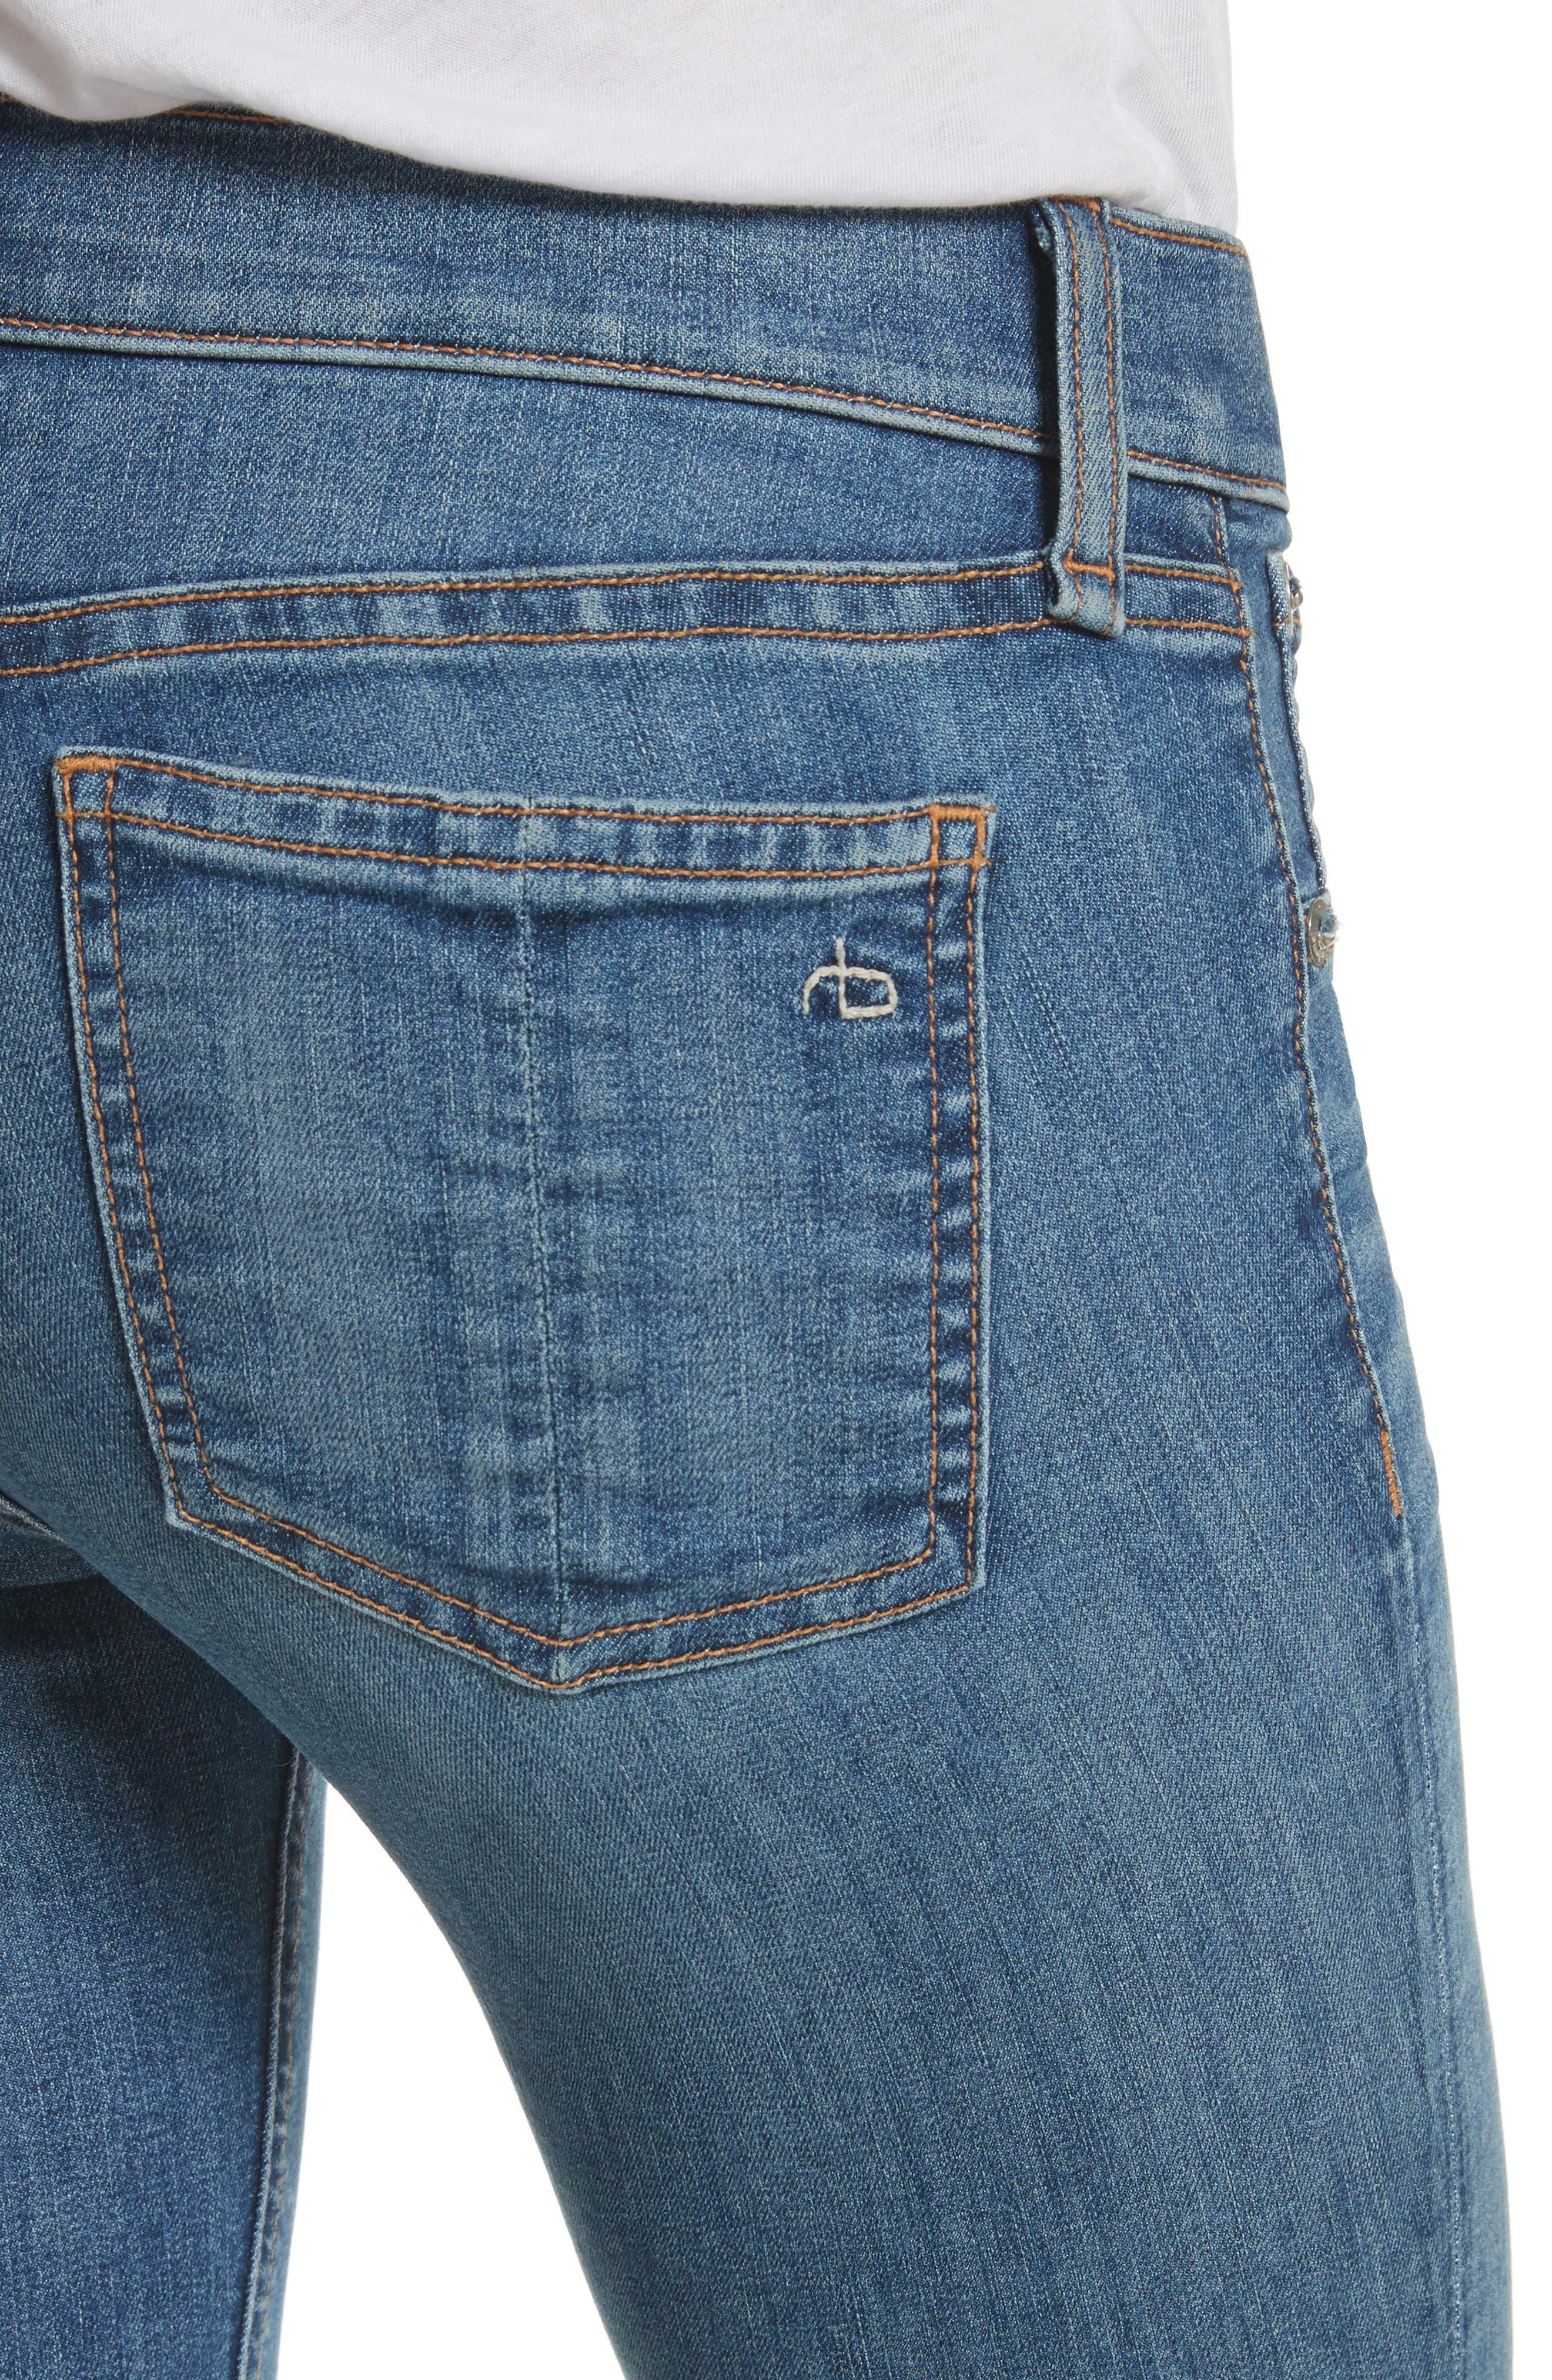 Skinny Jeans,                             Alternate thumbnail 4, color,                             402